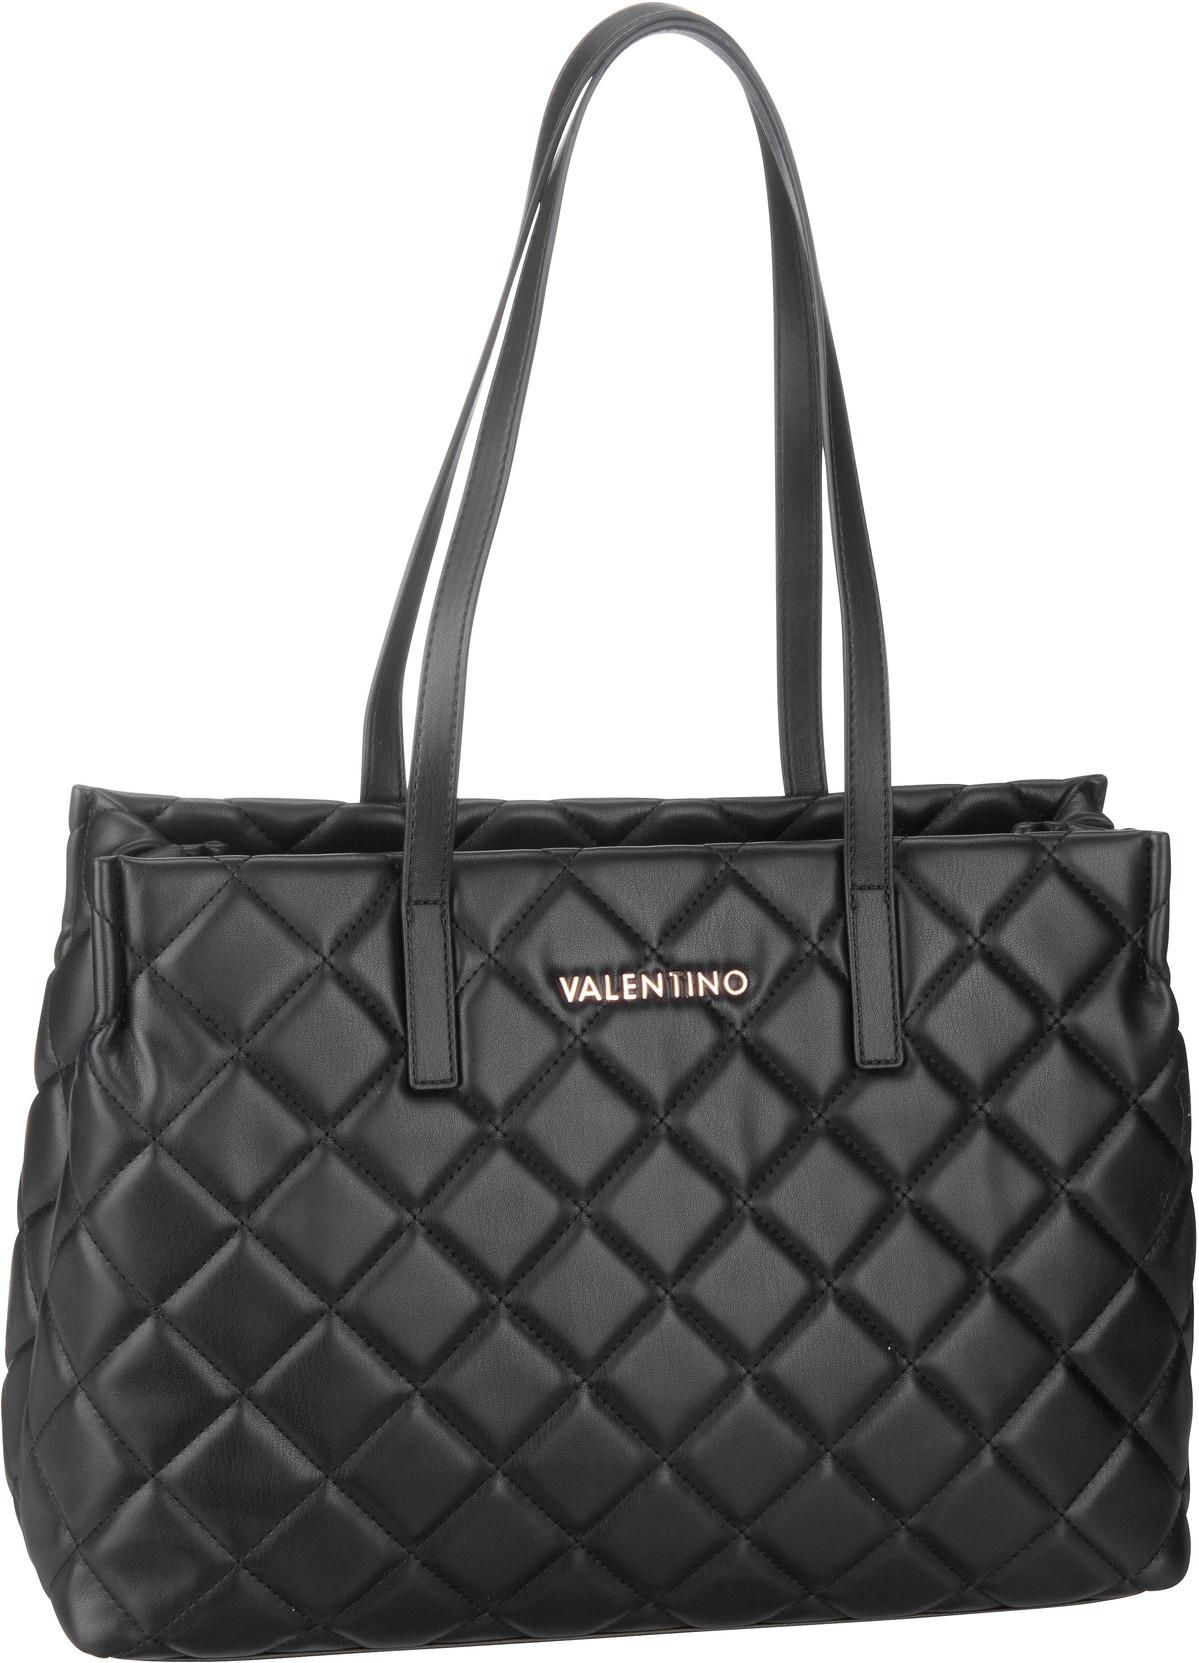 Bags Handtasche Ocarina Shopping K10 Nero